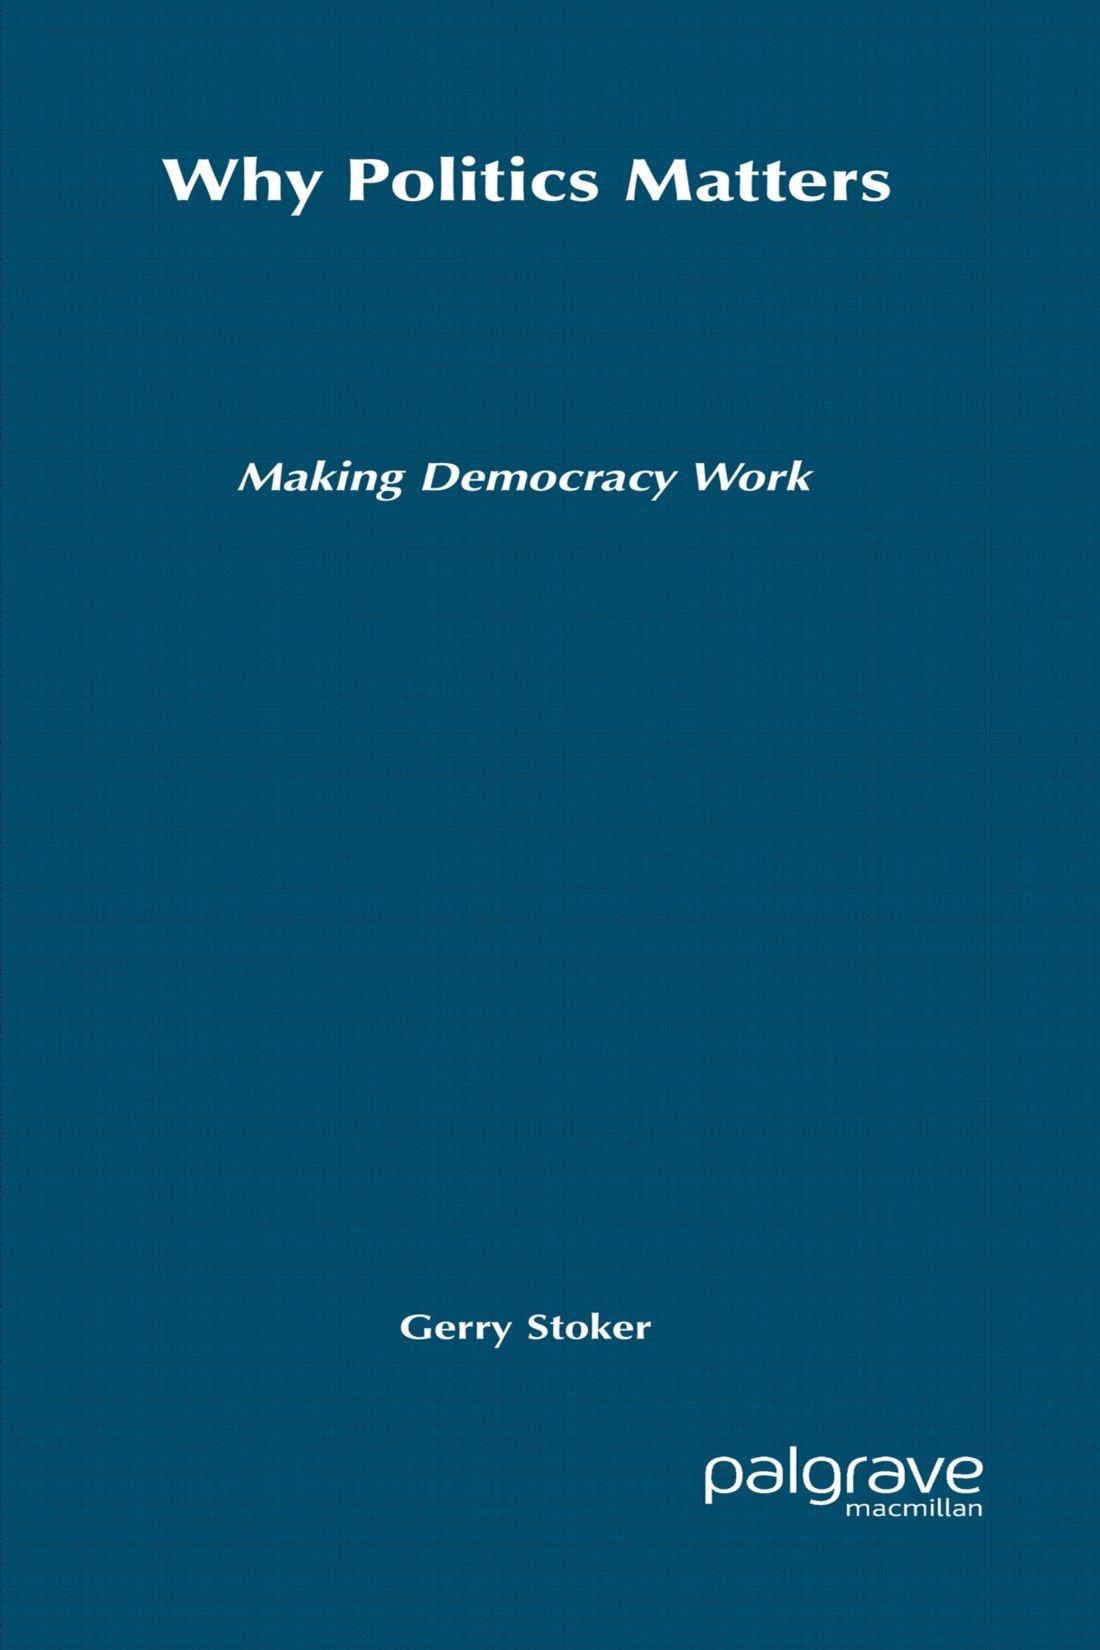 Why Politics Matters: Making Democracy Work